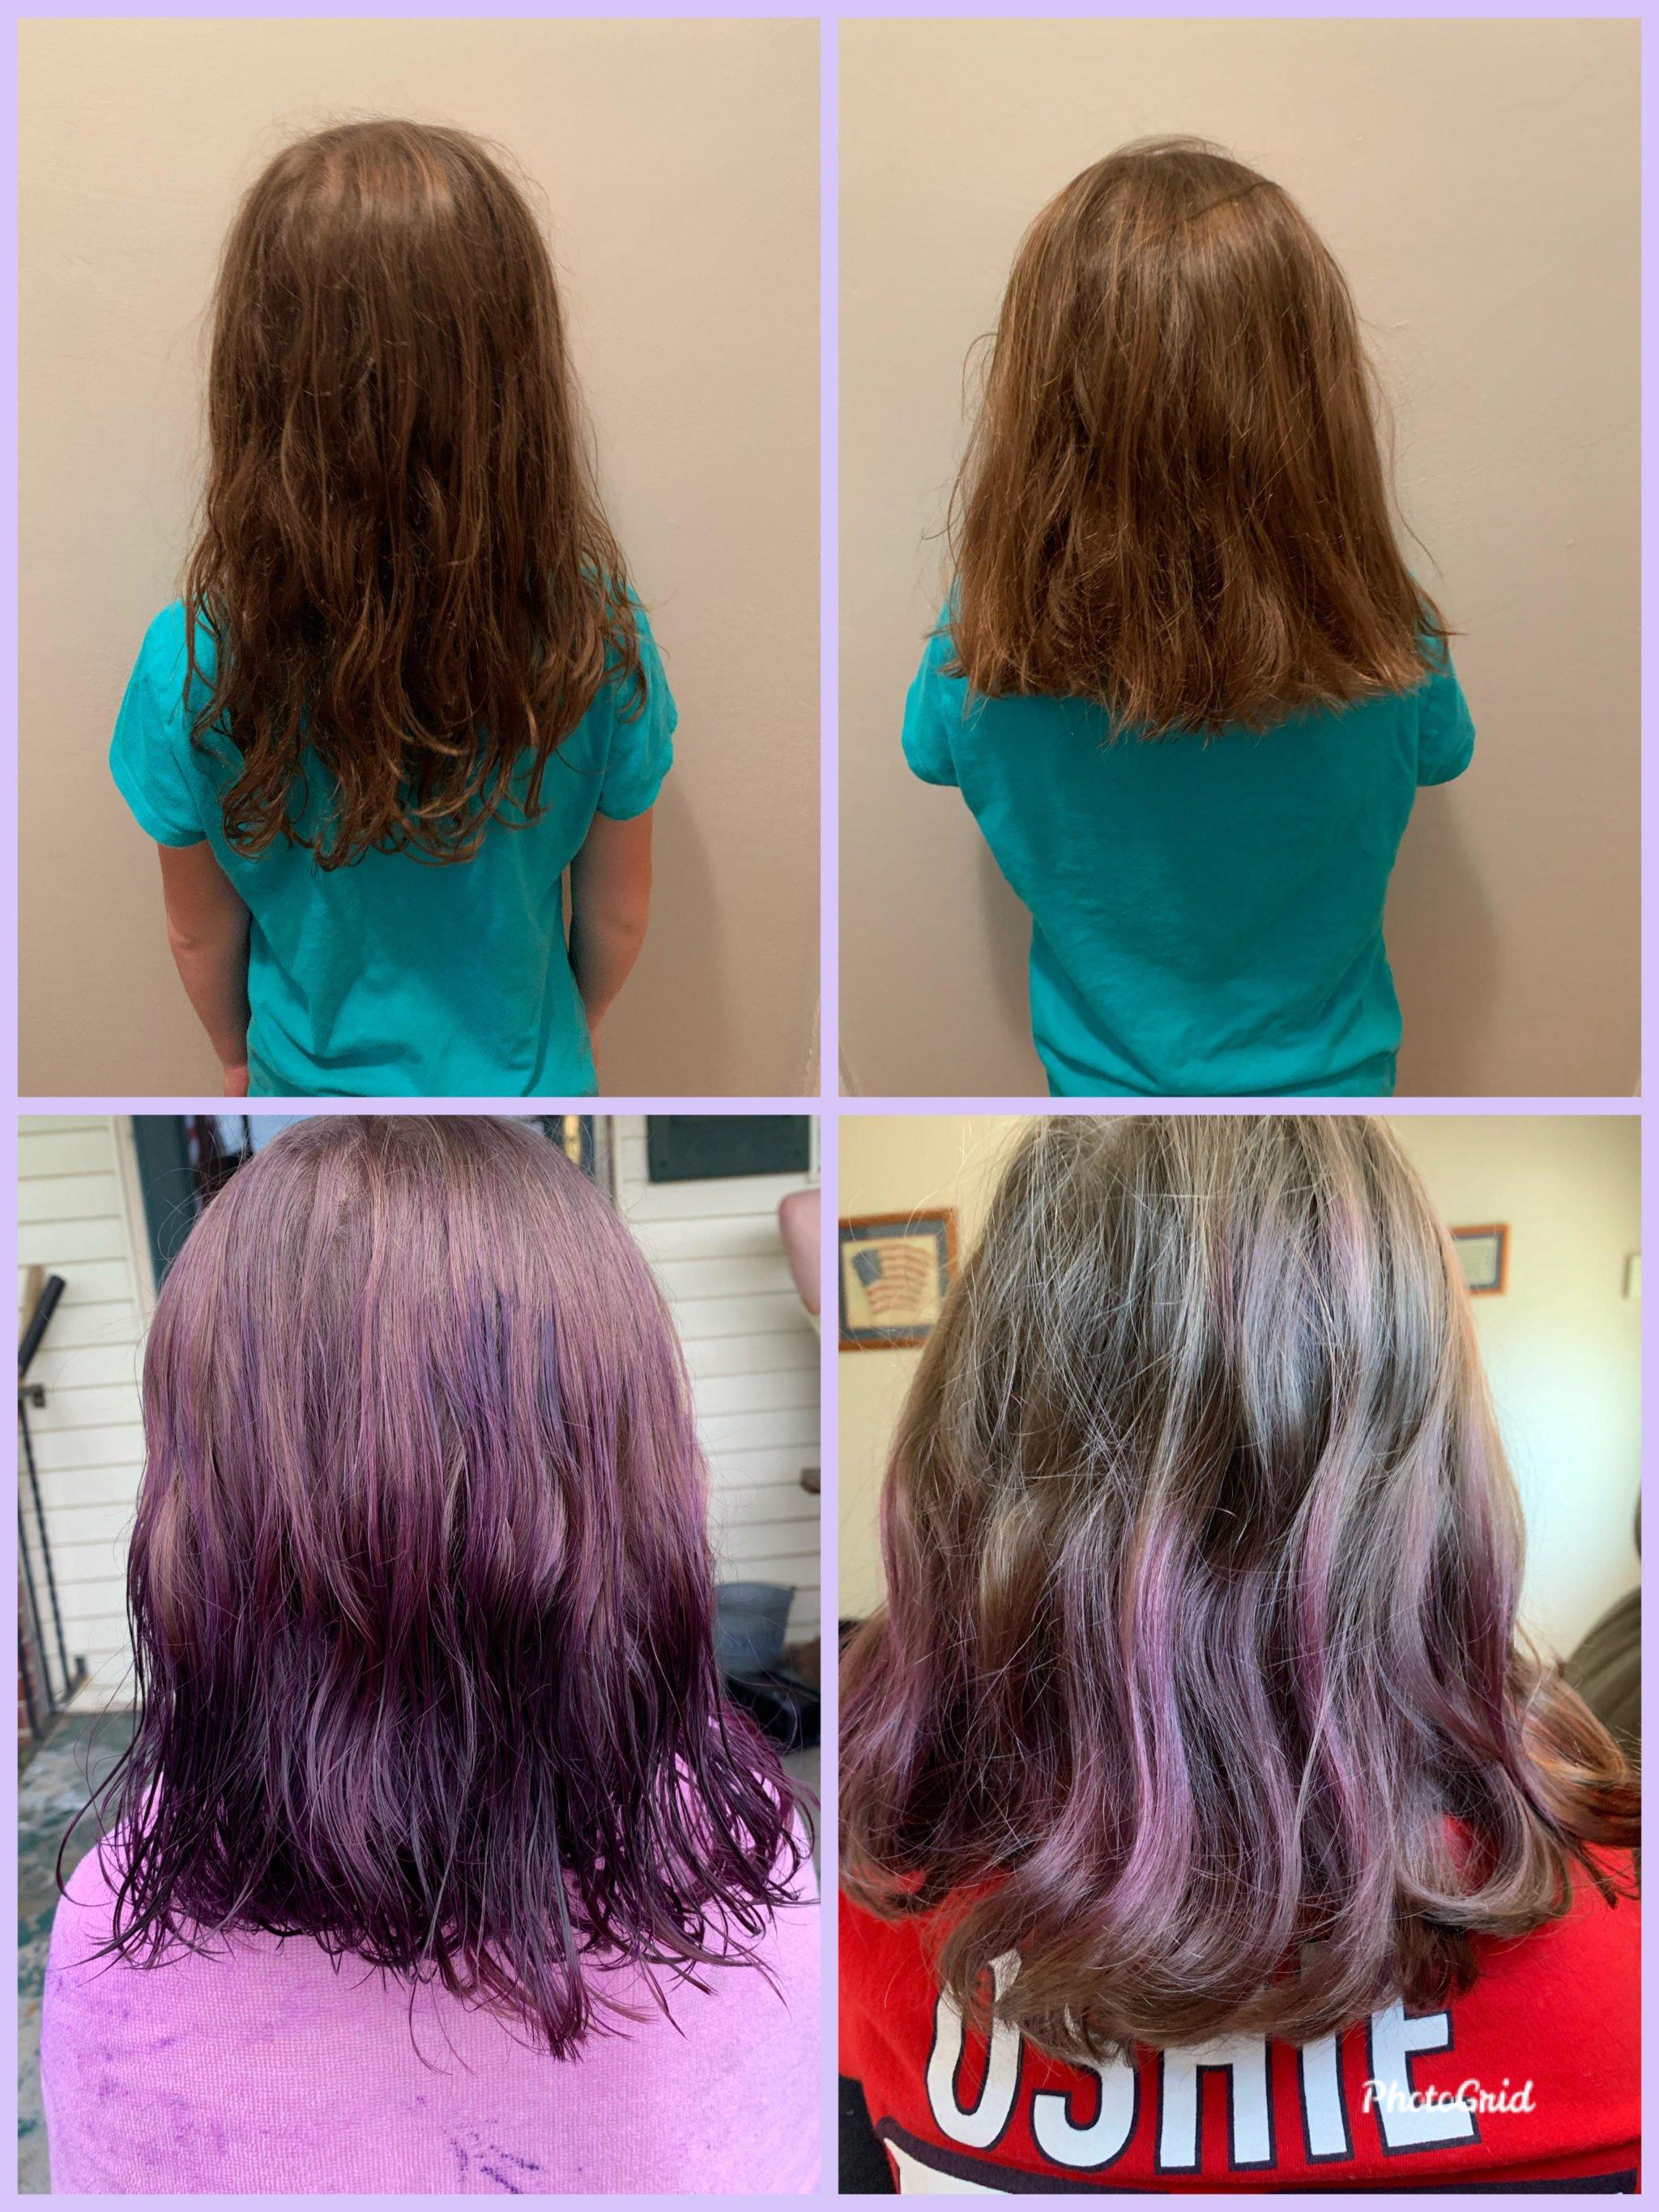 hercules-haircut-challenge